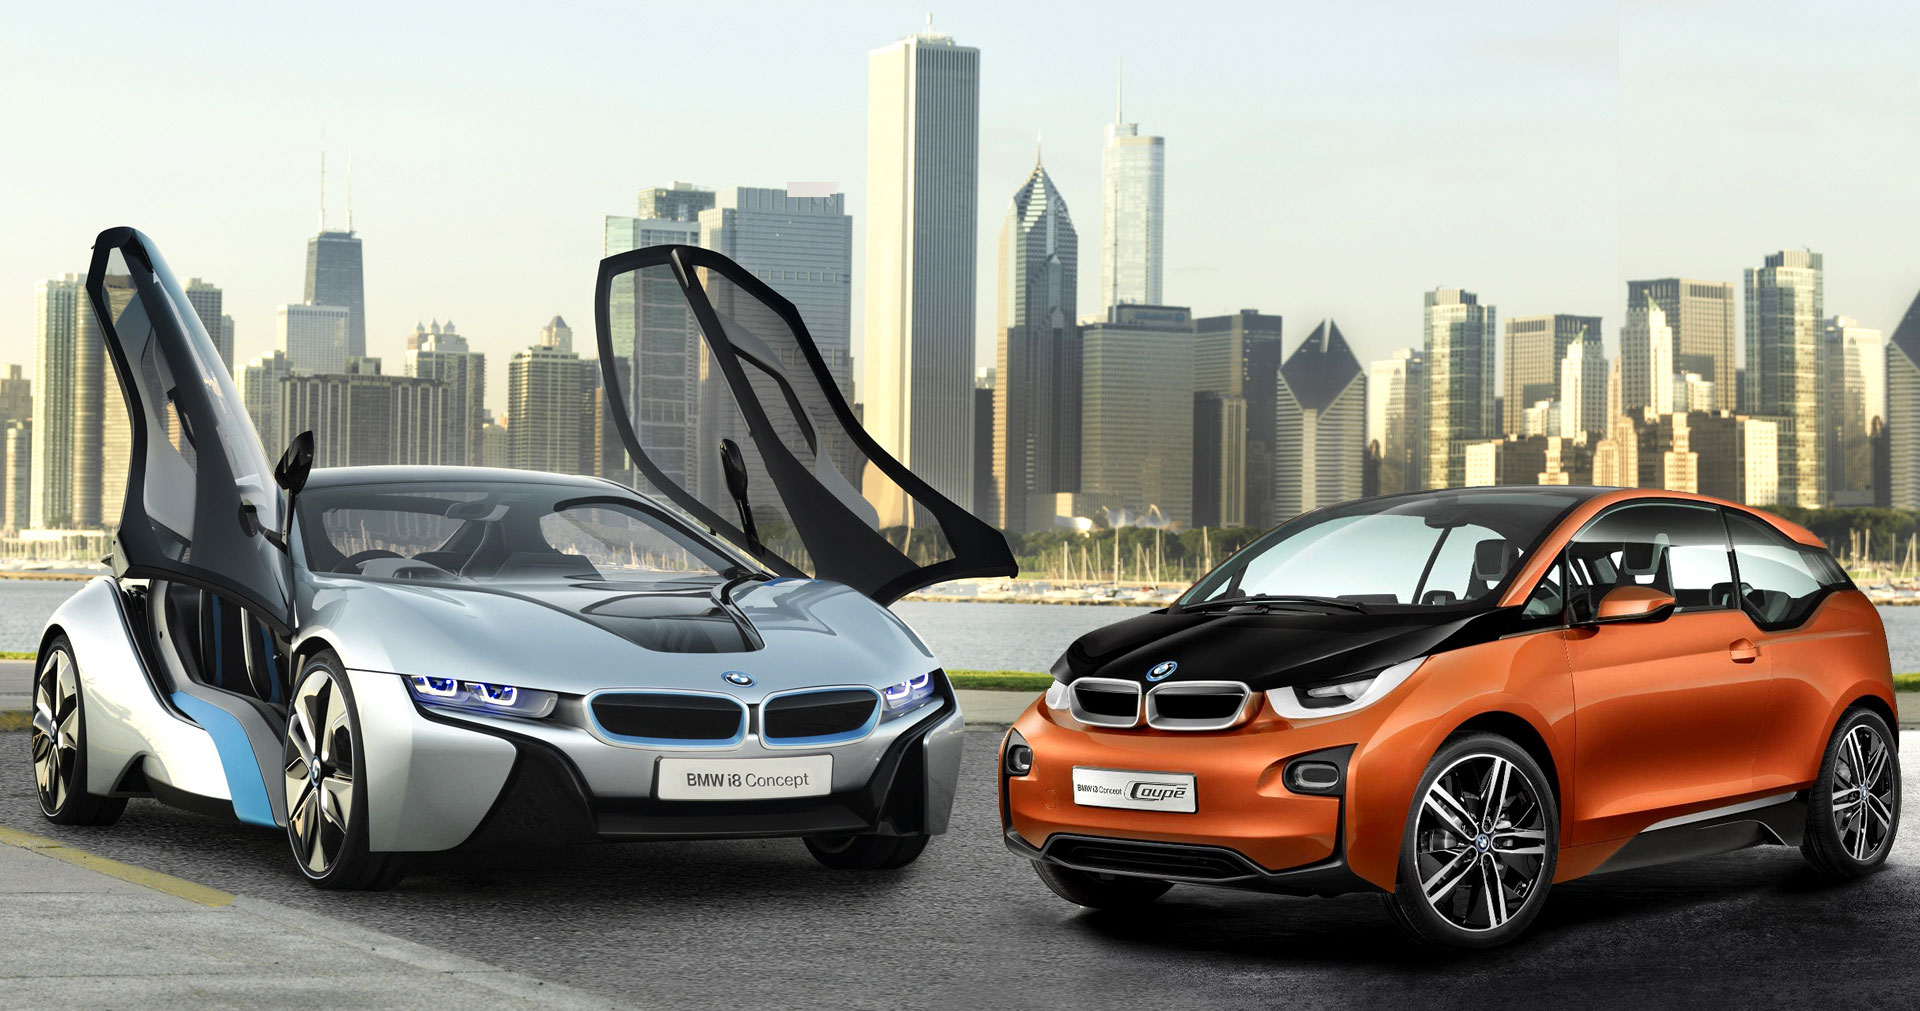 BMW i3 and BMW i8 Concept